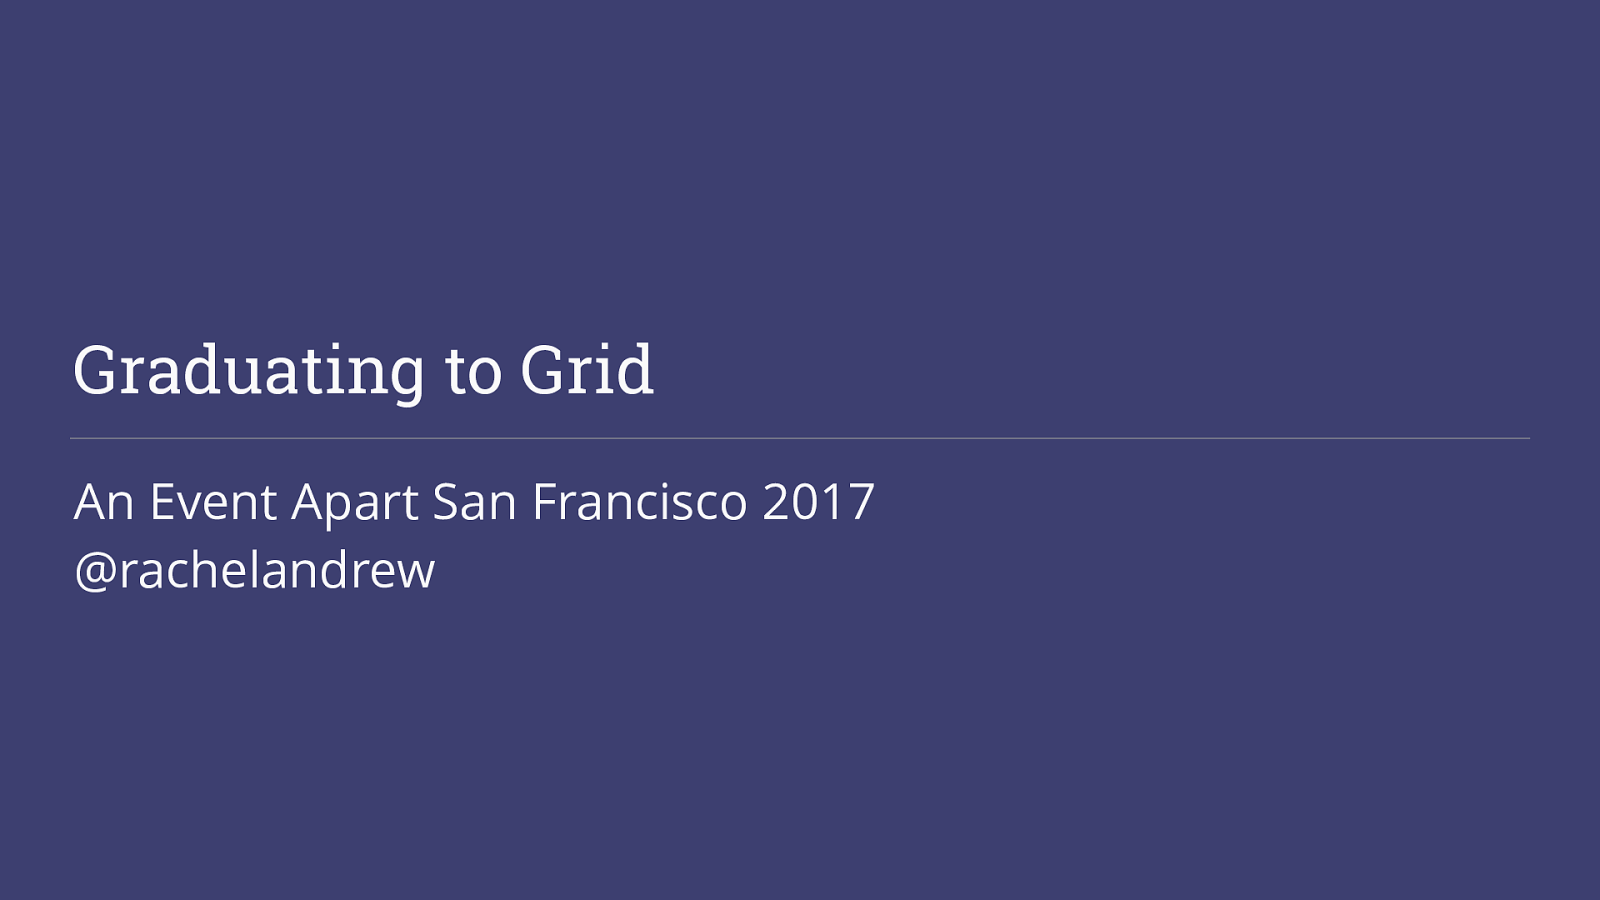 Graduating to Grid